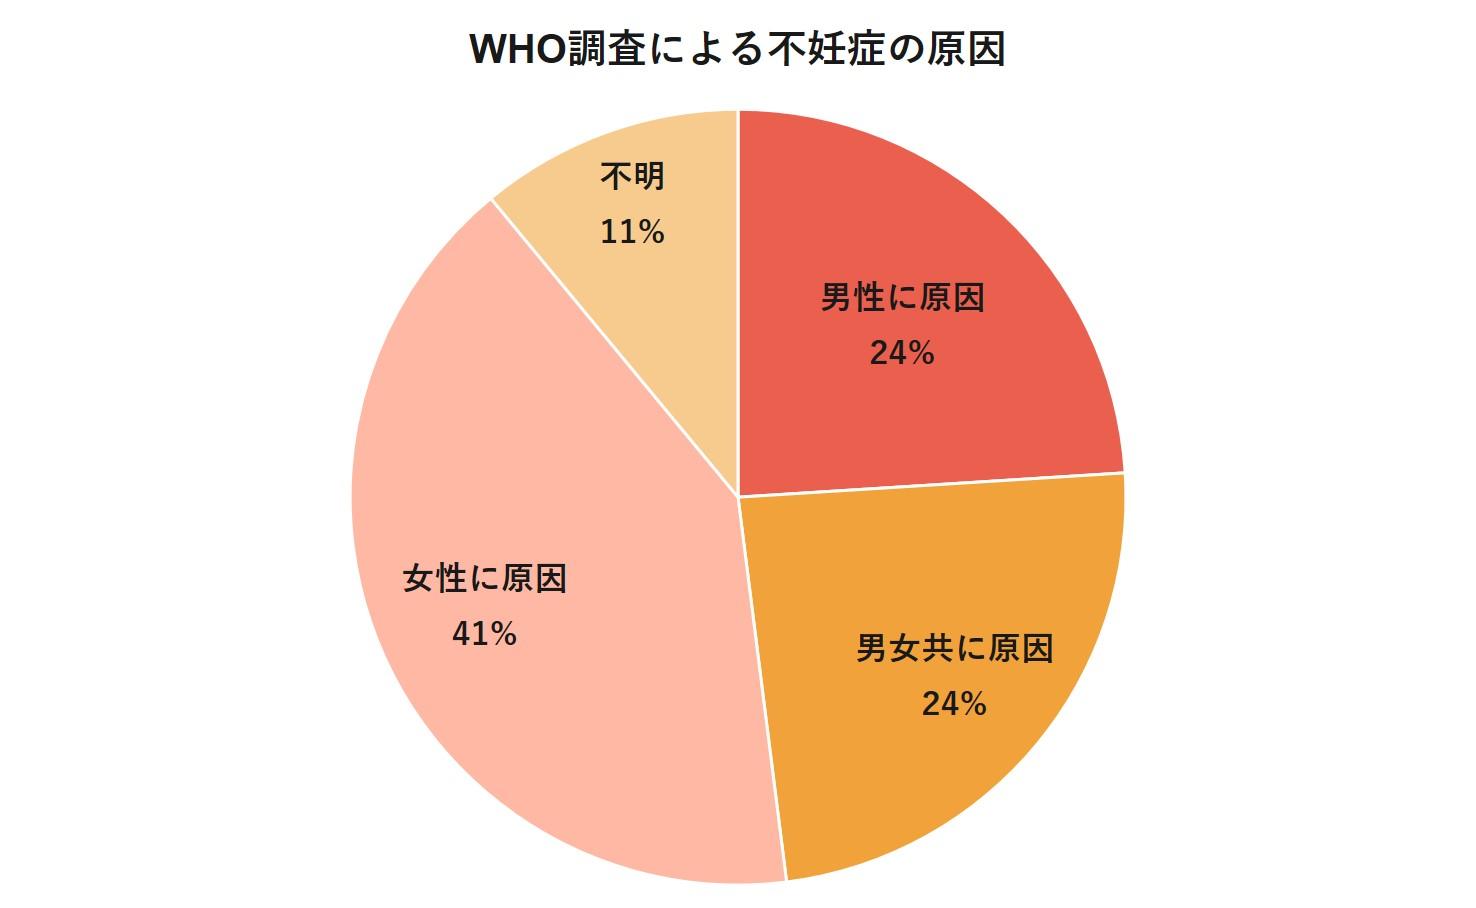 WHO調査による不妊症の原因